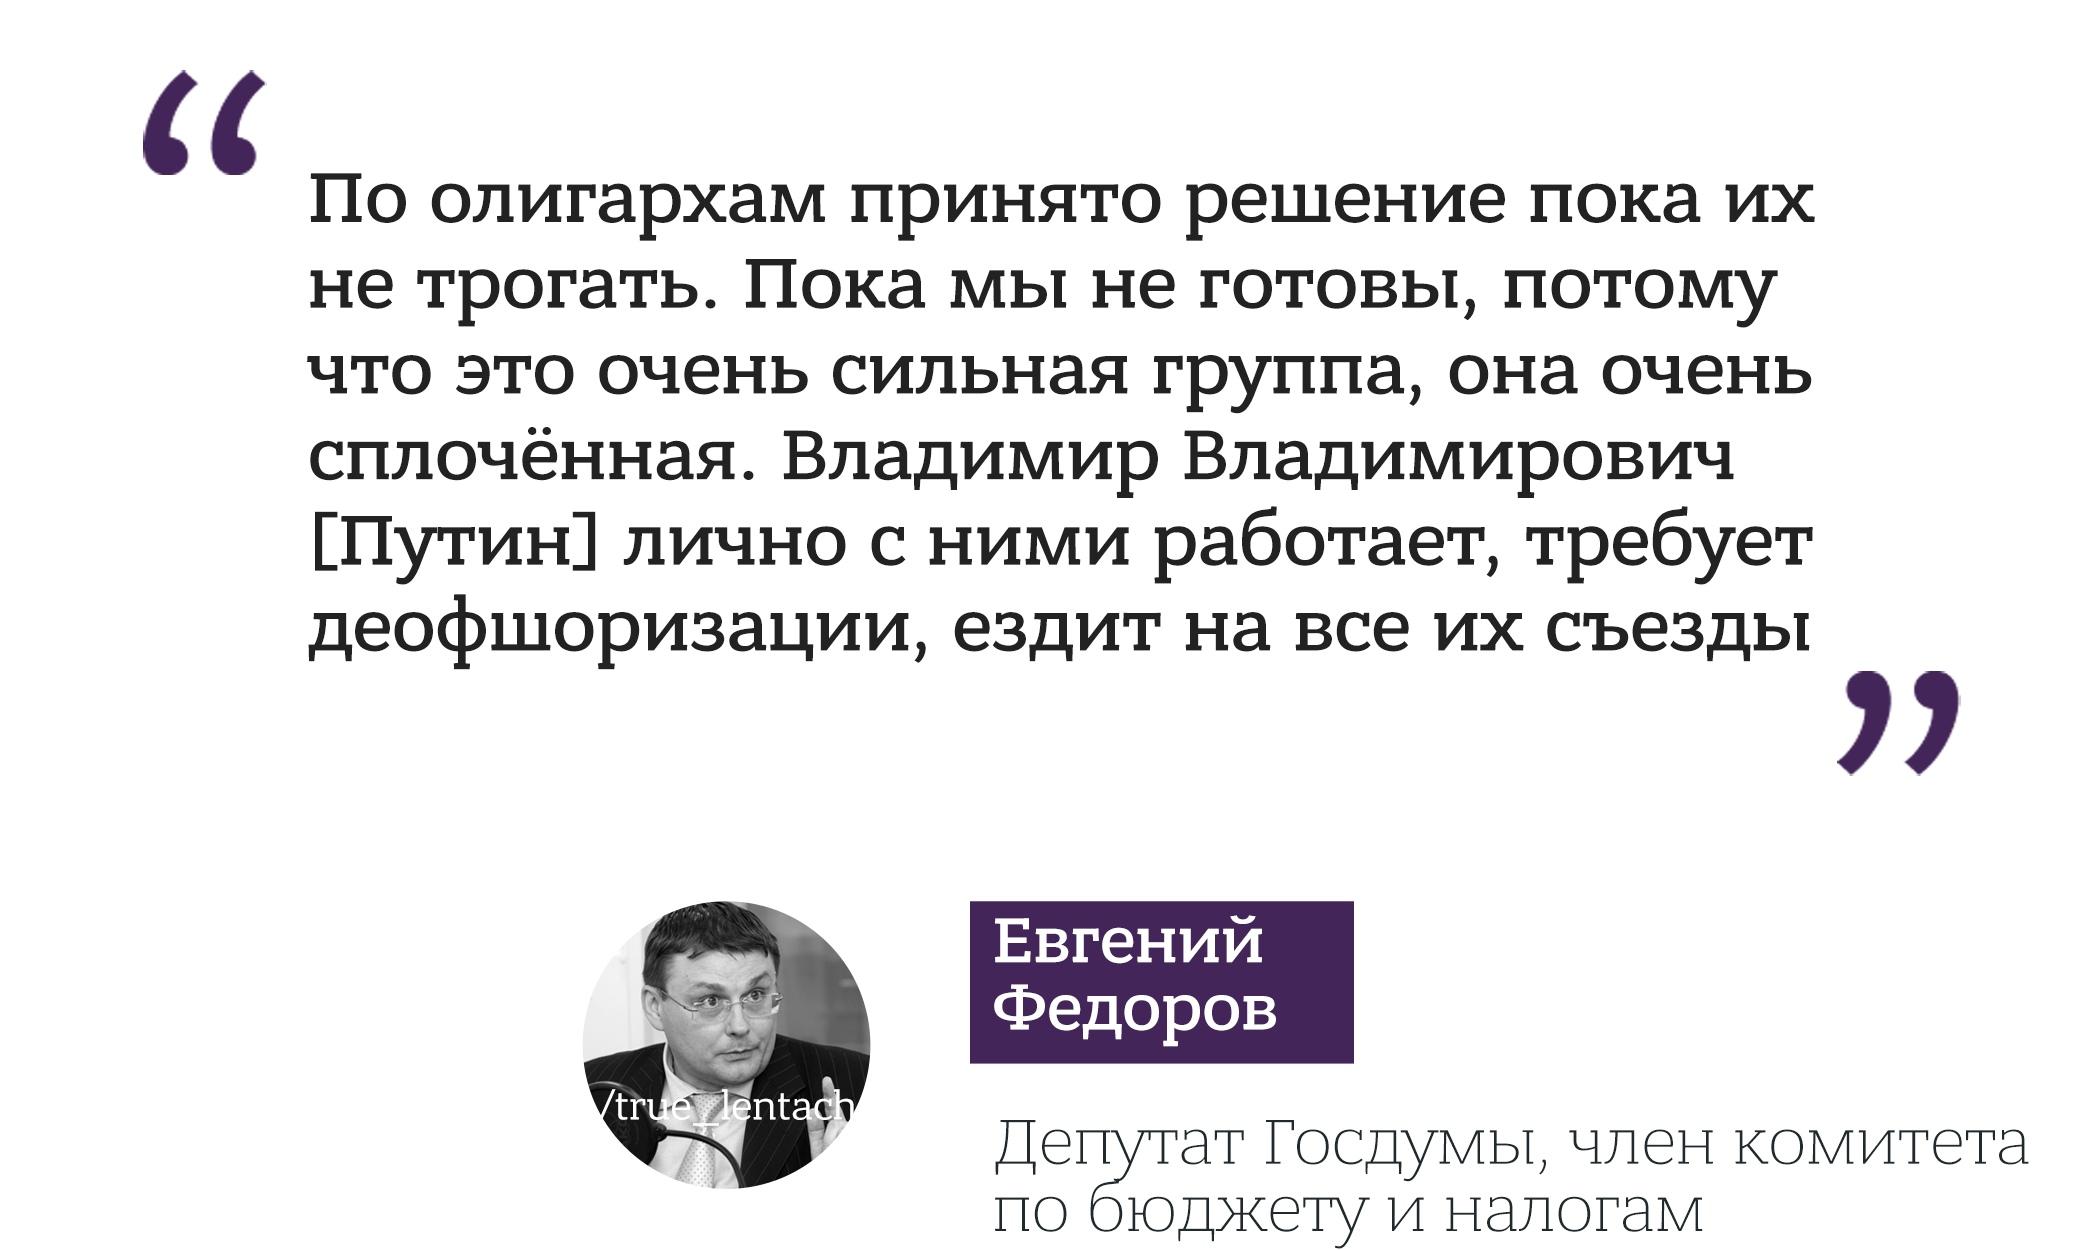 Мудро.Владимир Владимирович!